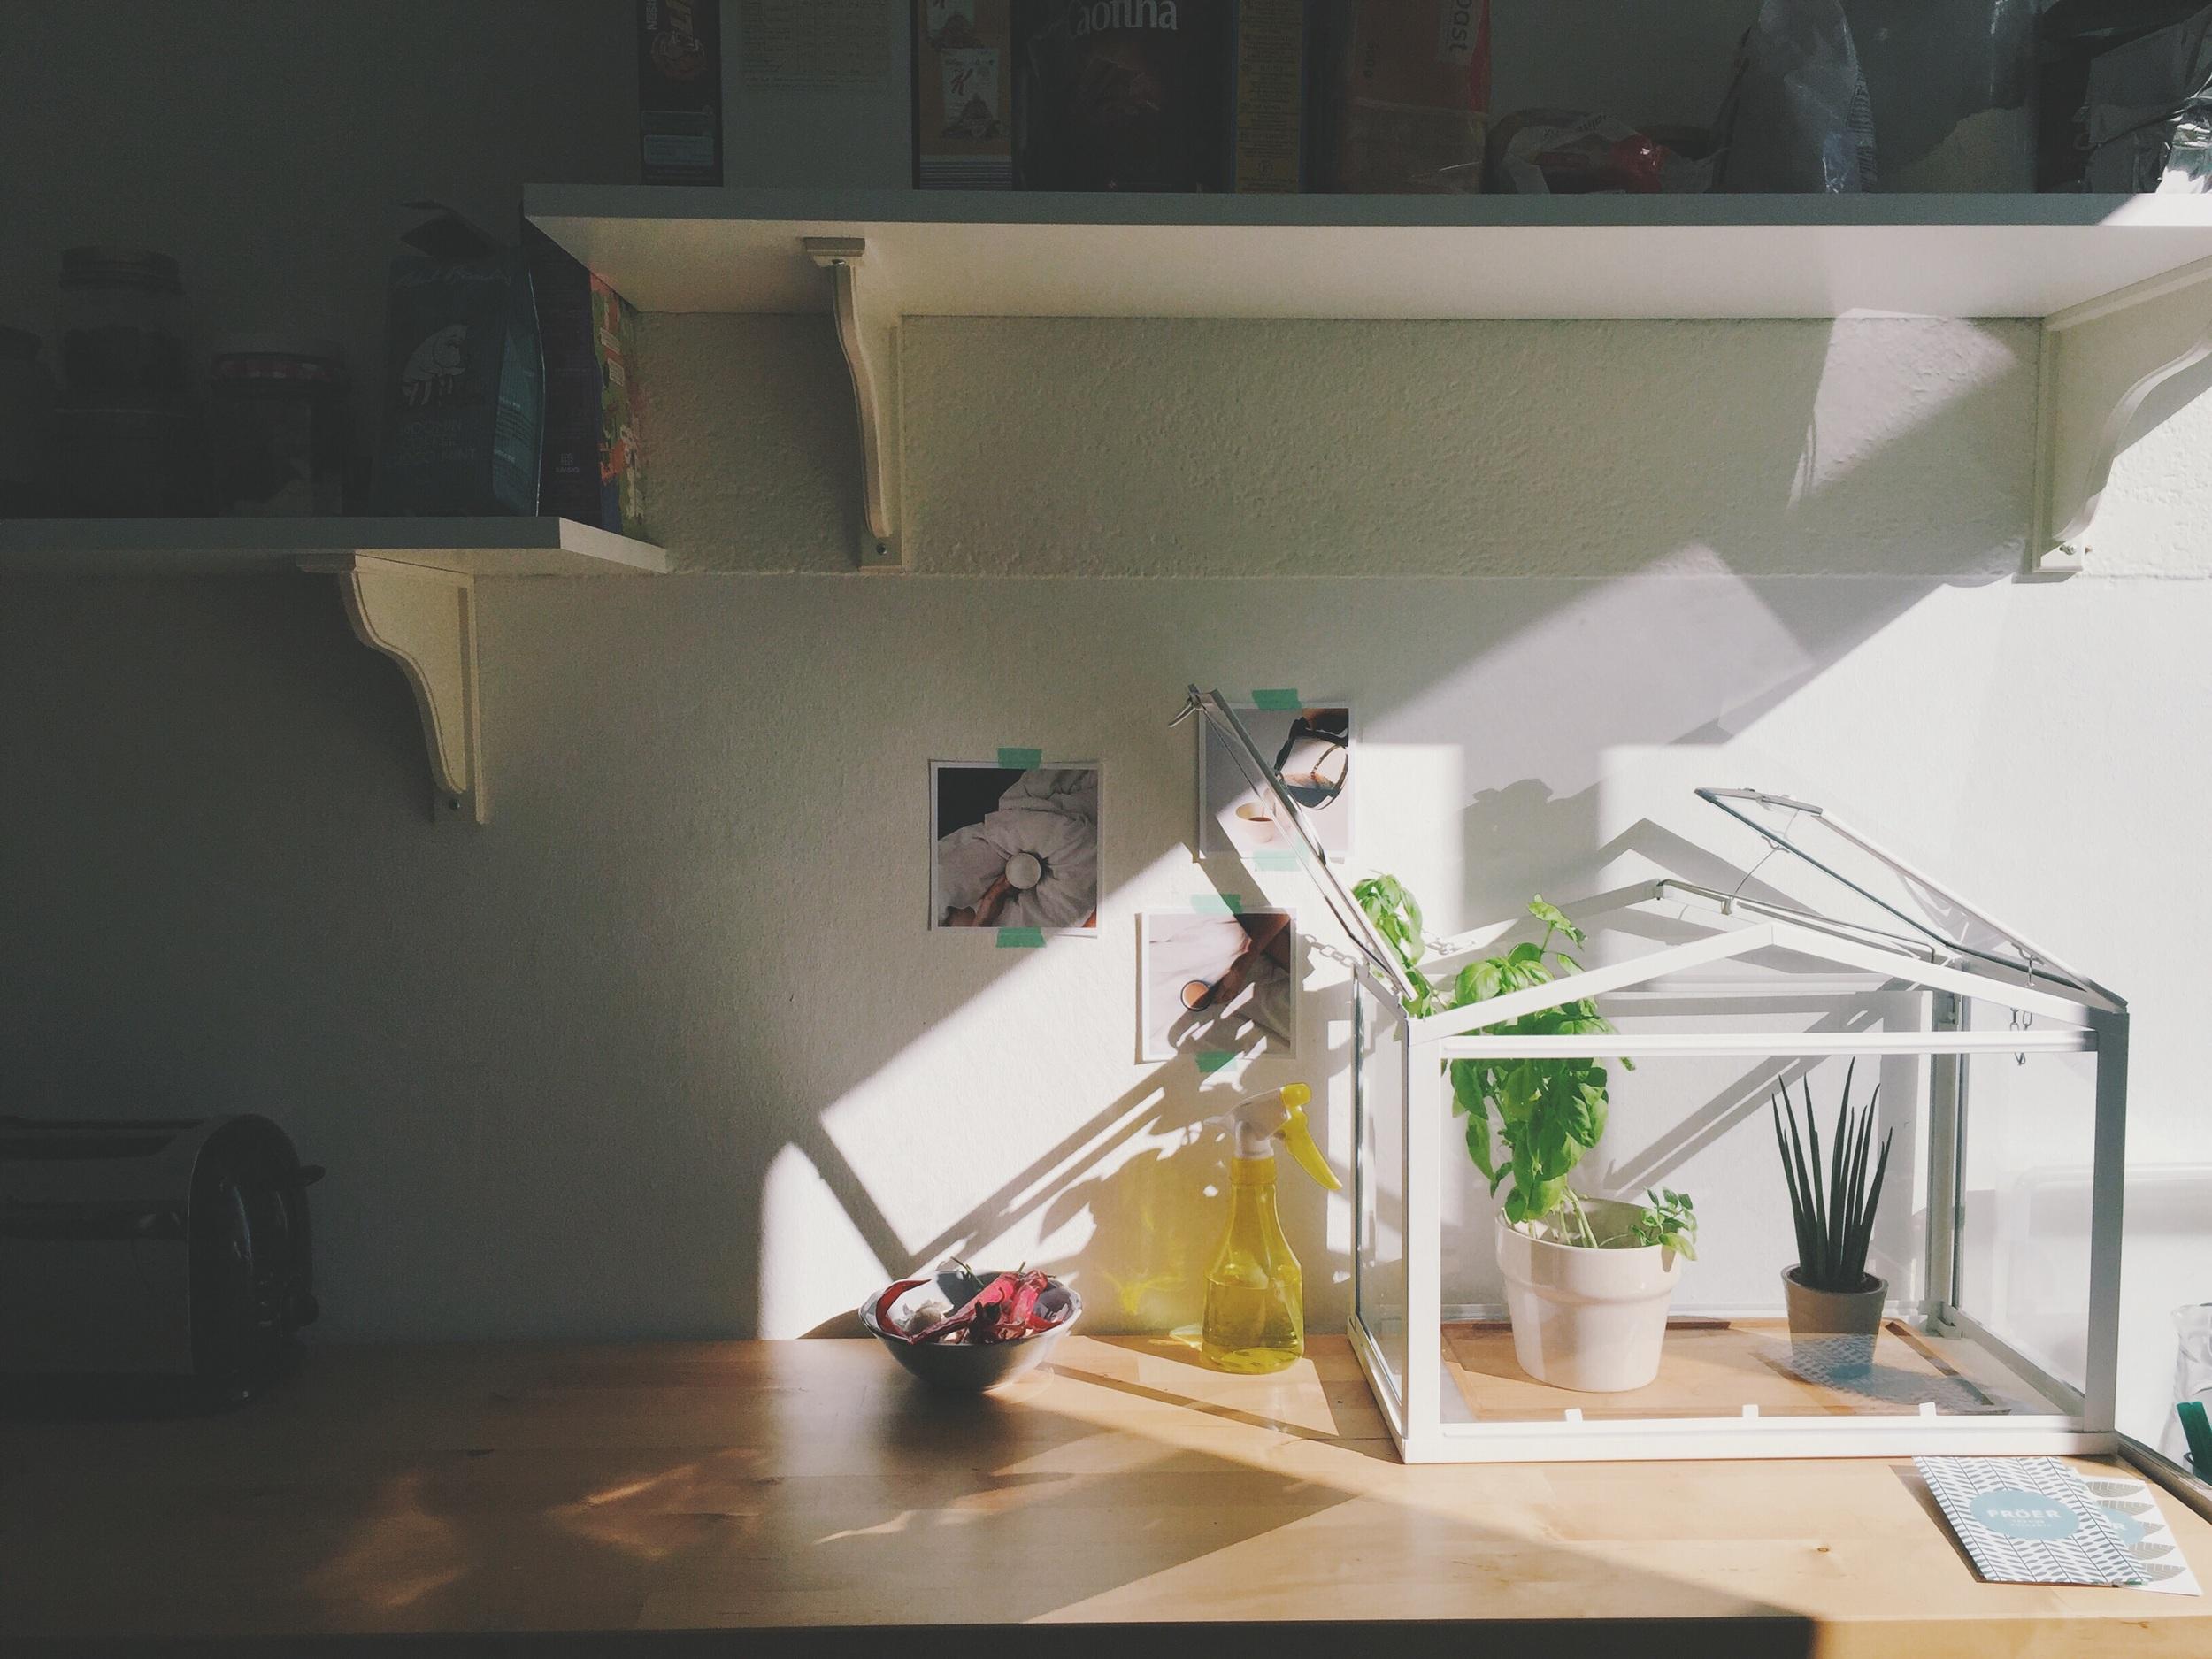 Basilikumpesto IKEA Annina Berweger